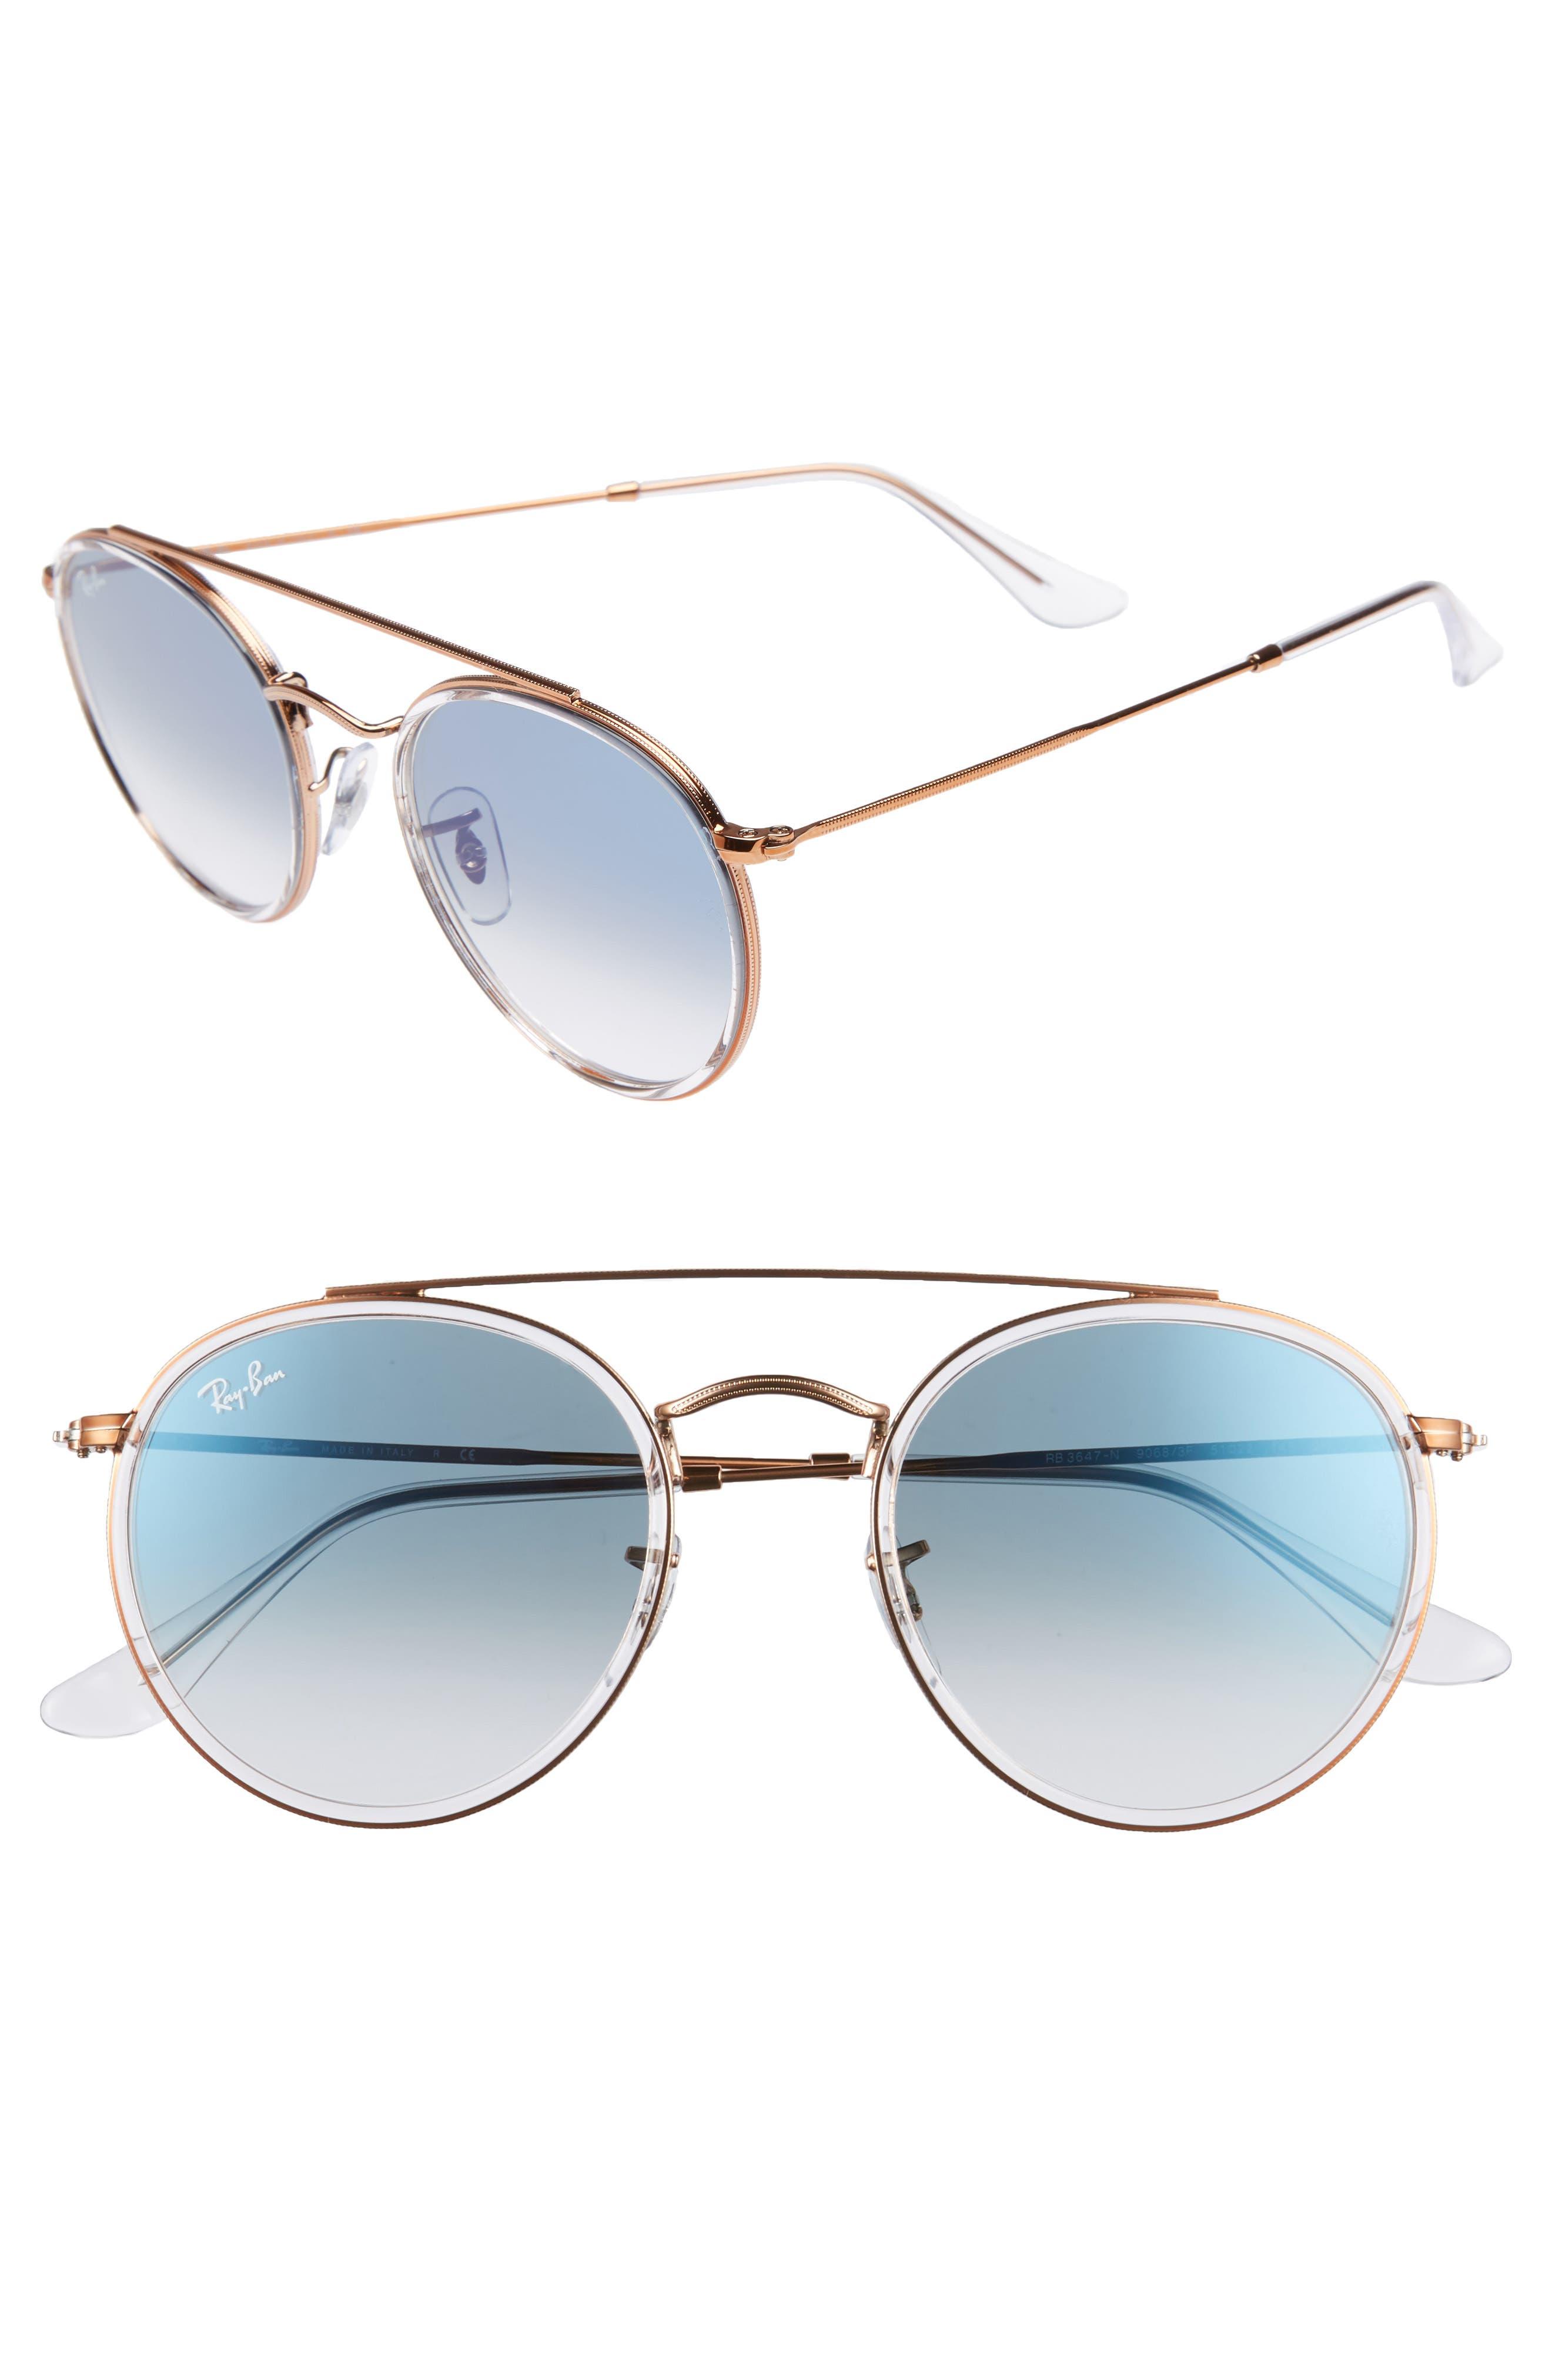 51mm Aviator Gradient Lens Sunglasses,                             Alternate thumbnail 5, color,